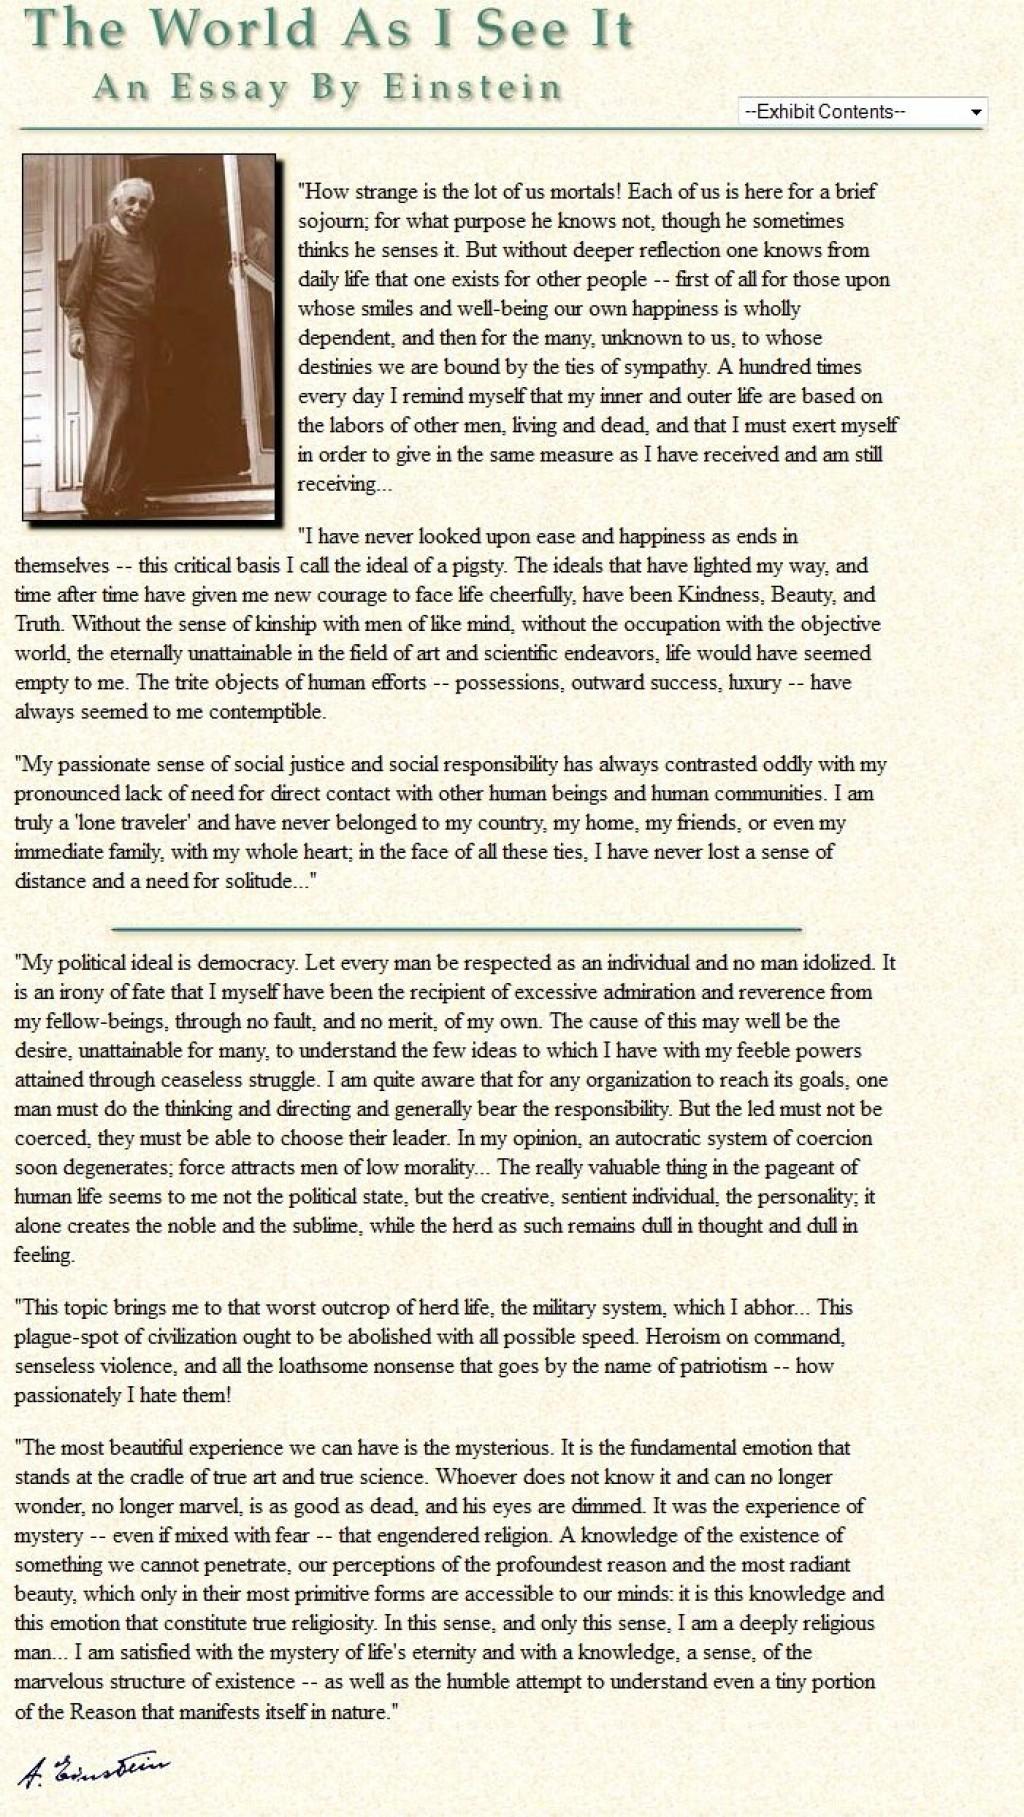 006 Albert Einstein Essay Awesome Essays In Humanism Pdf Science Kannada Large